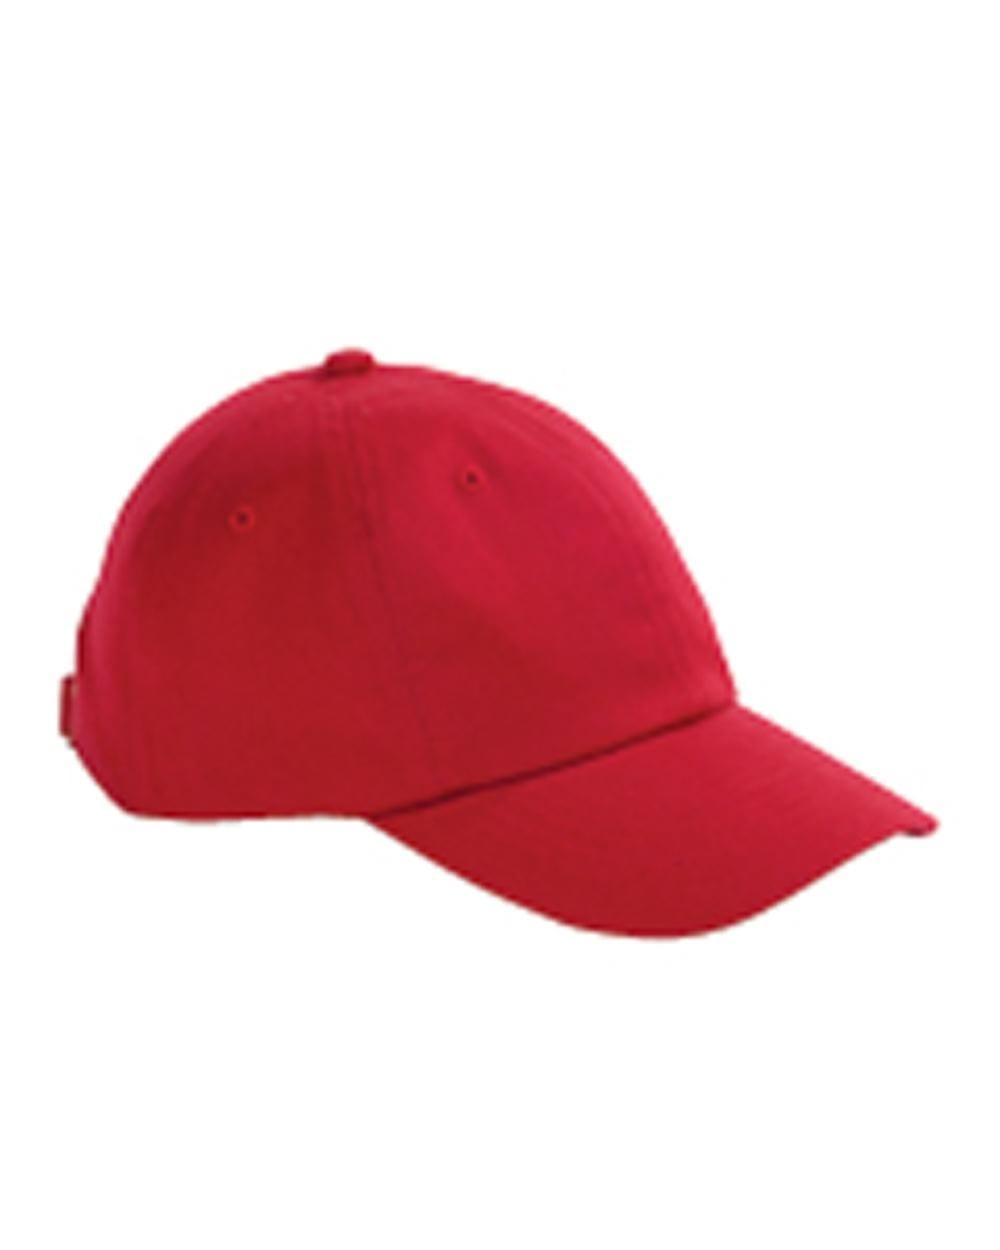 b326610de1d6c custom hats big accessories bx001 6-panel brushed twill unstructured custom  hat red